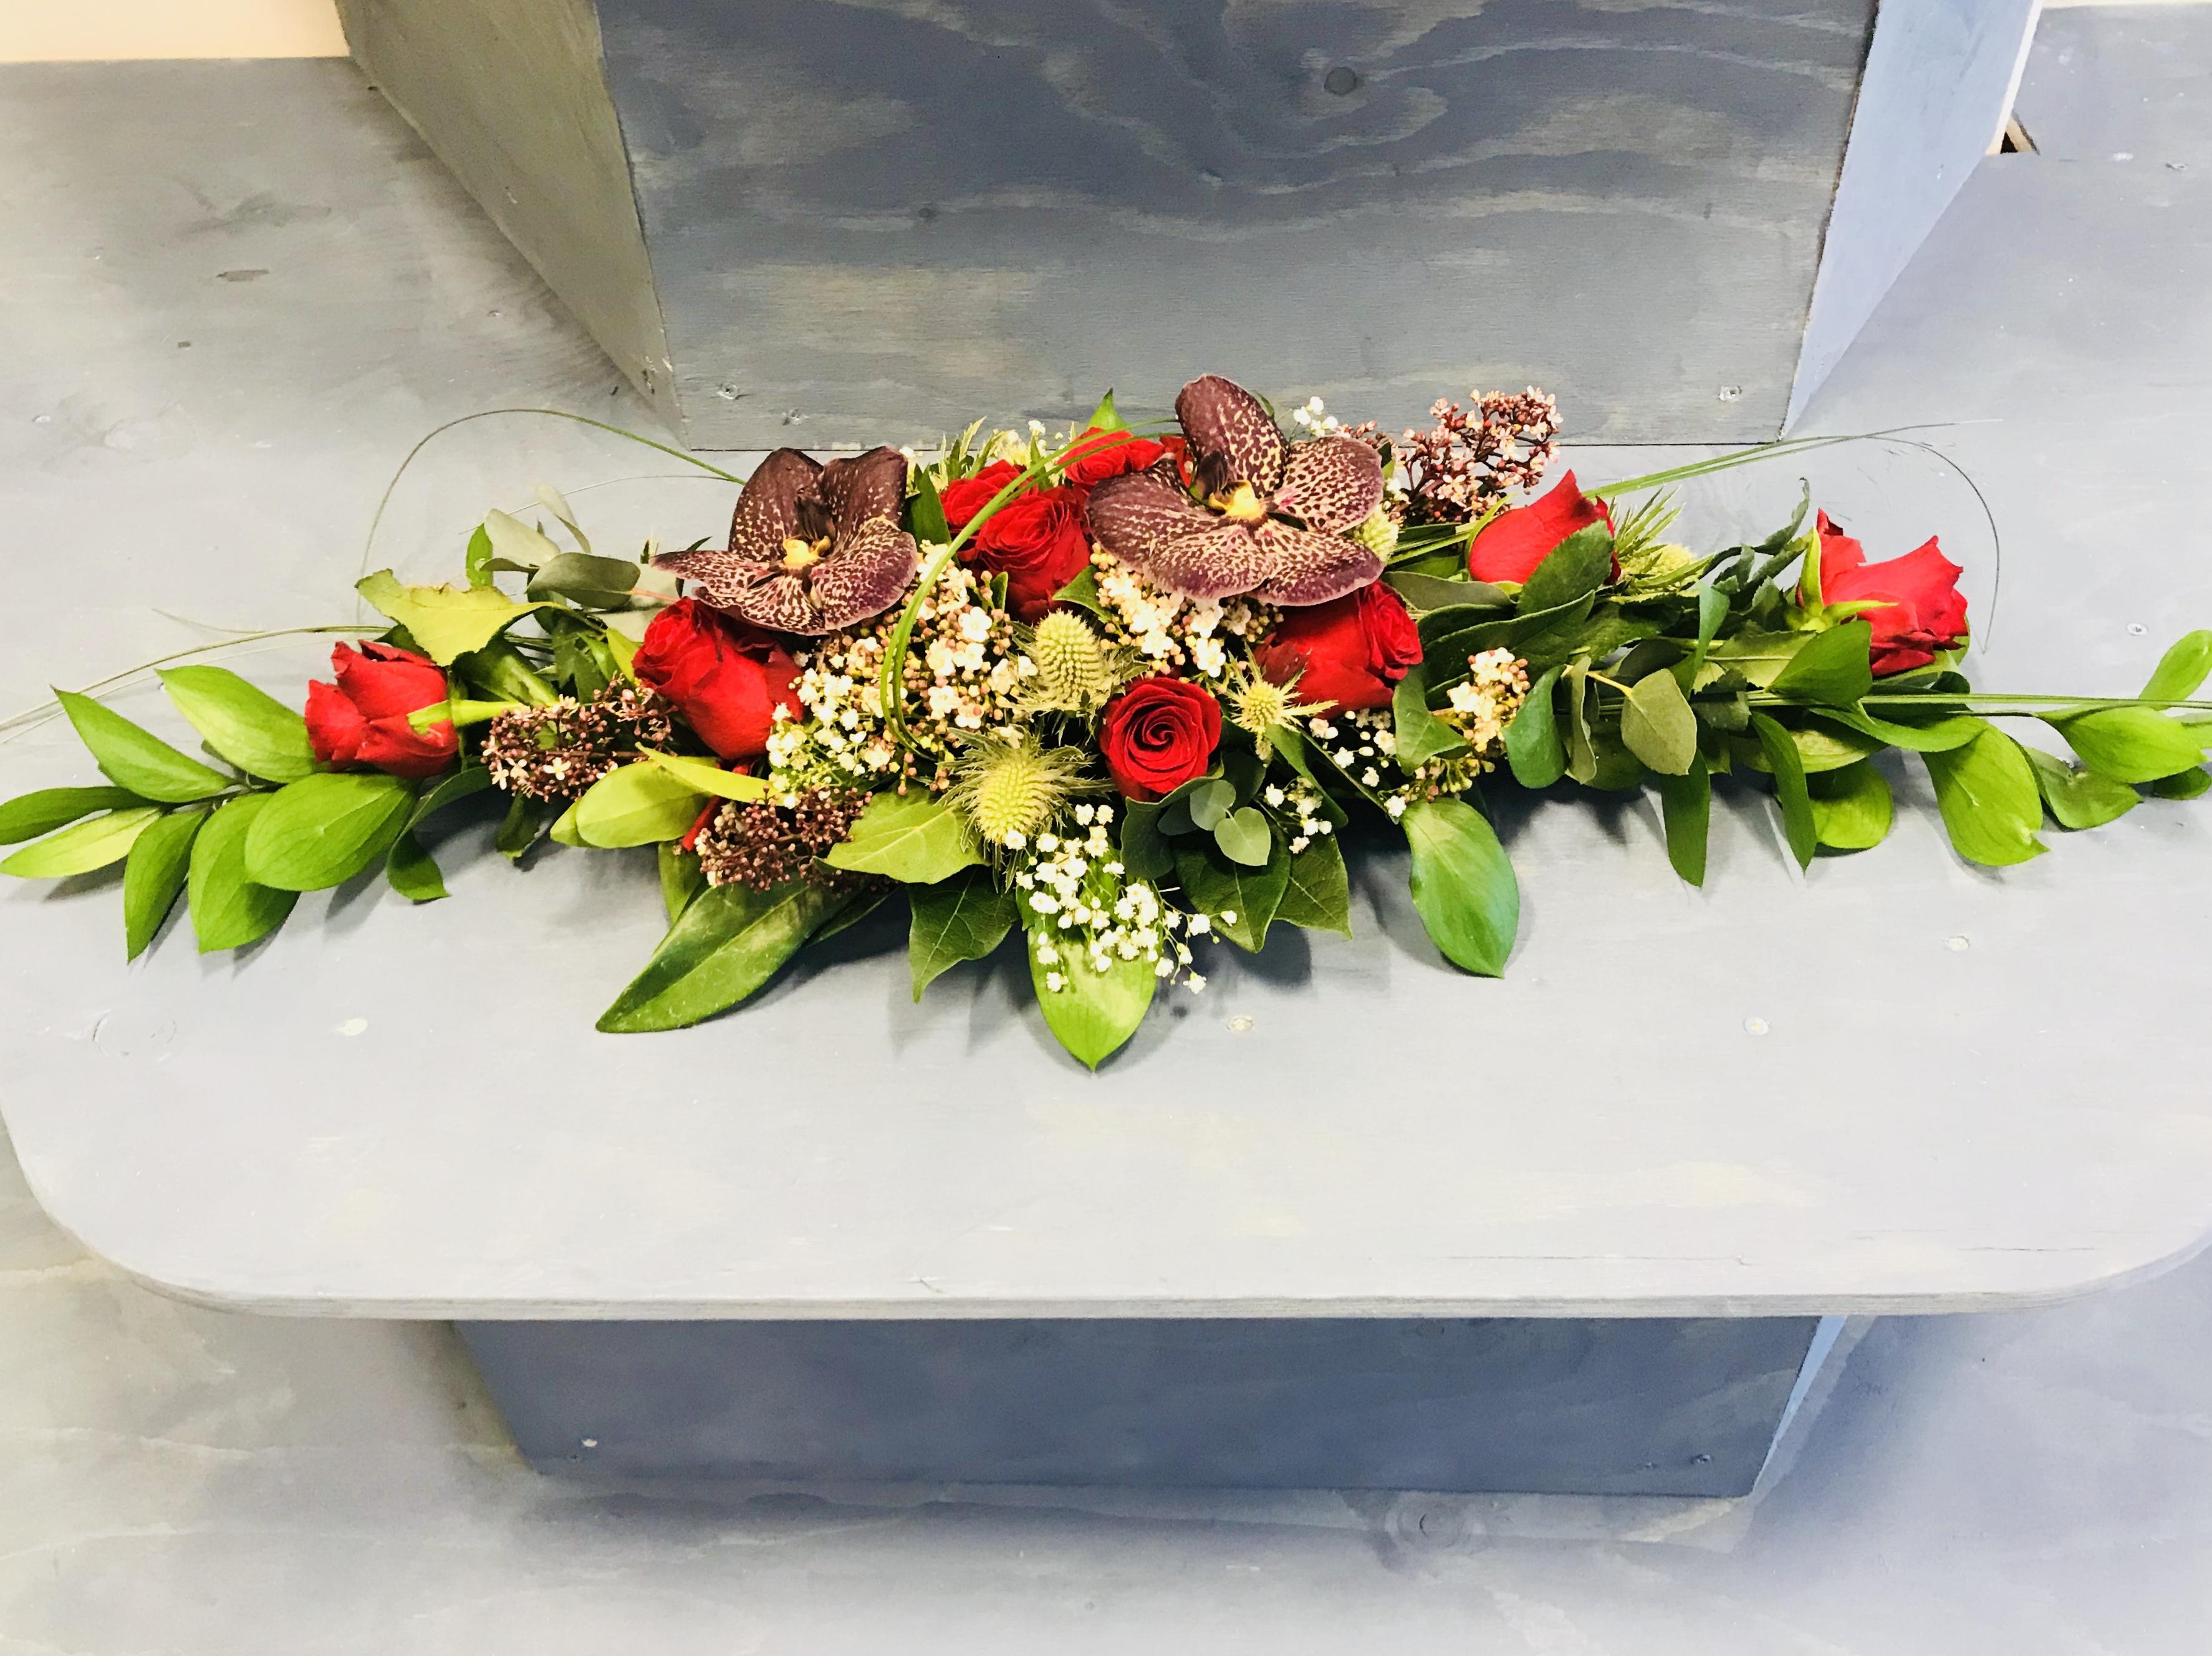 Avlang dekorasjon m/ekslusive orkideér